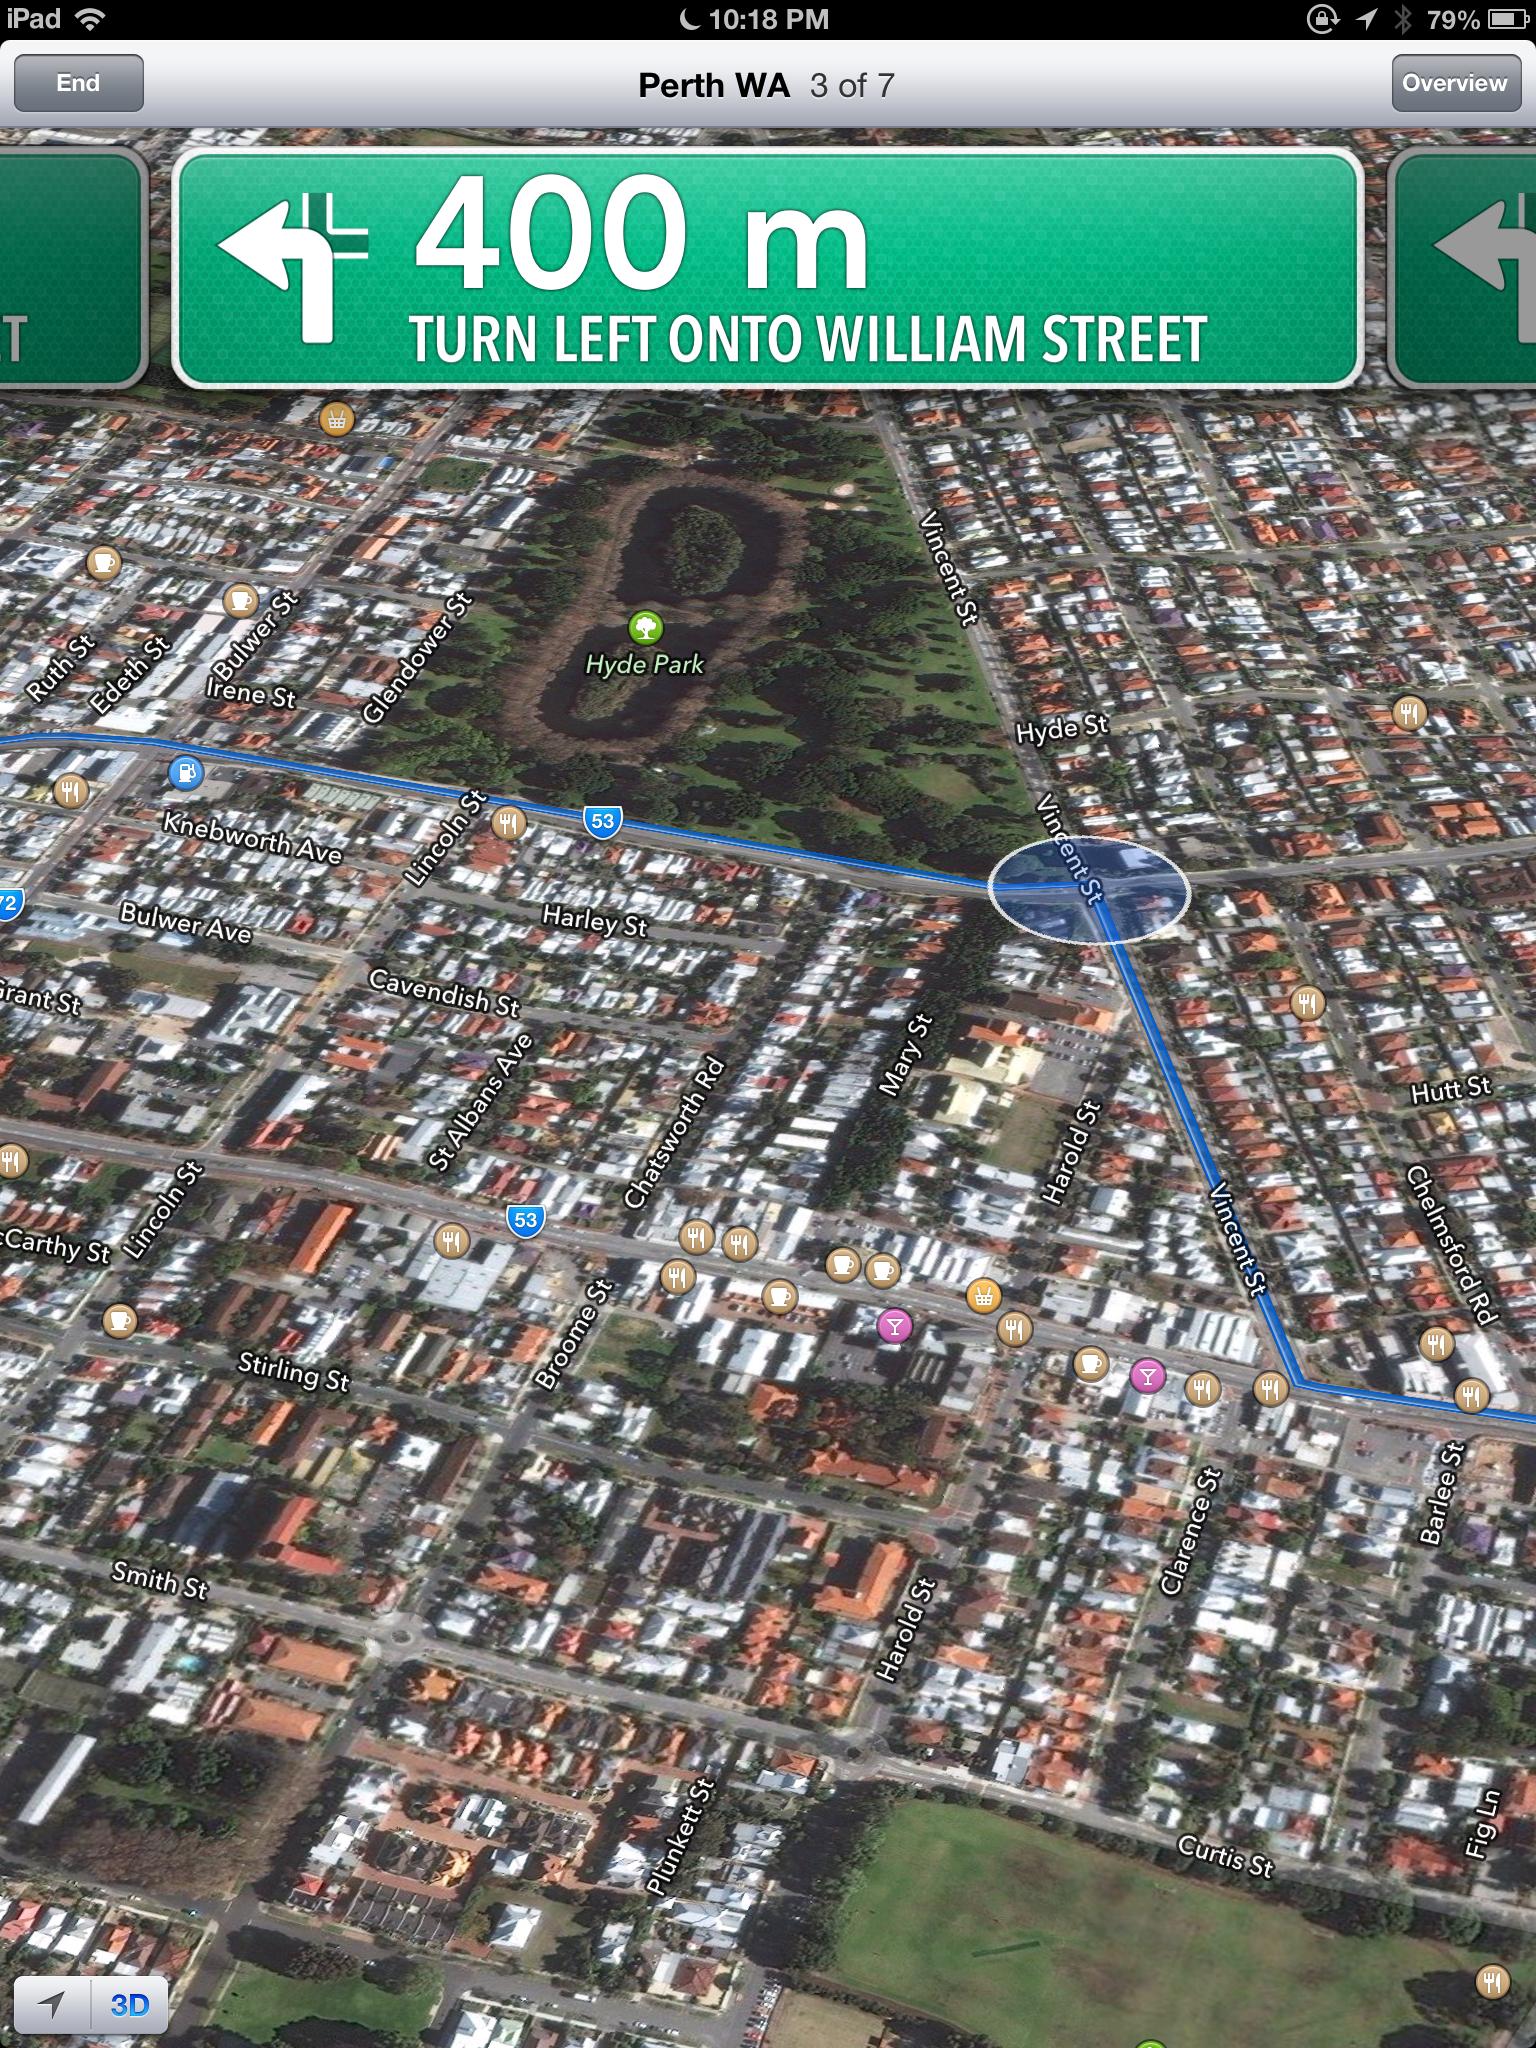 Apple Maps on iPad in iOS6